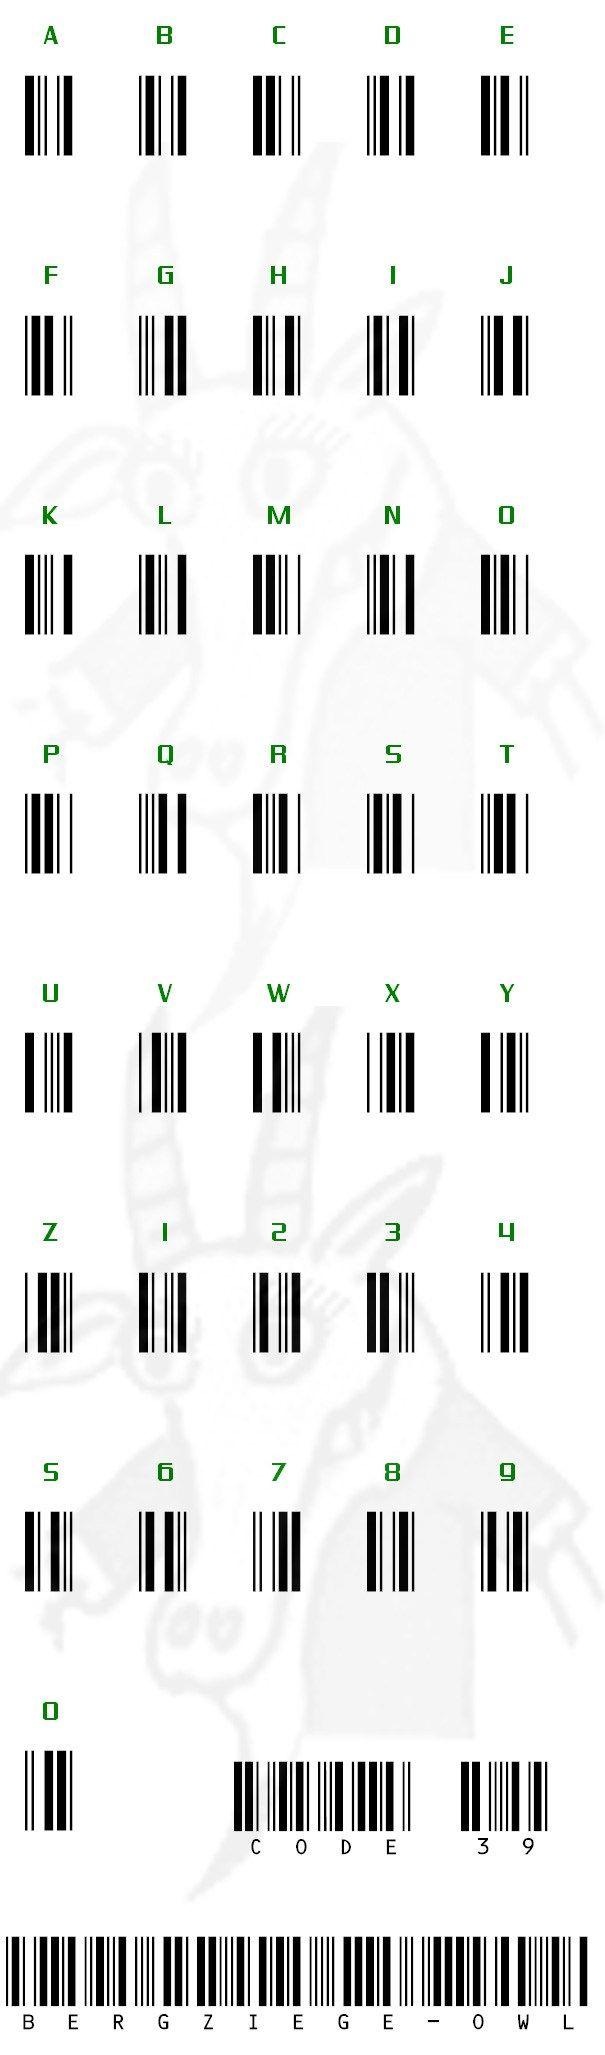 u00c9pingl u00e9 par faf sur code barre